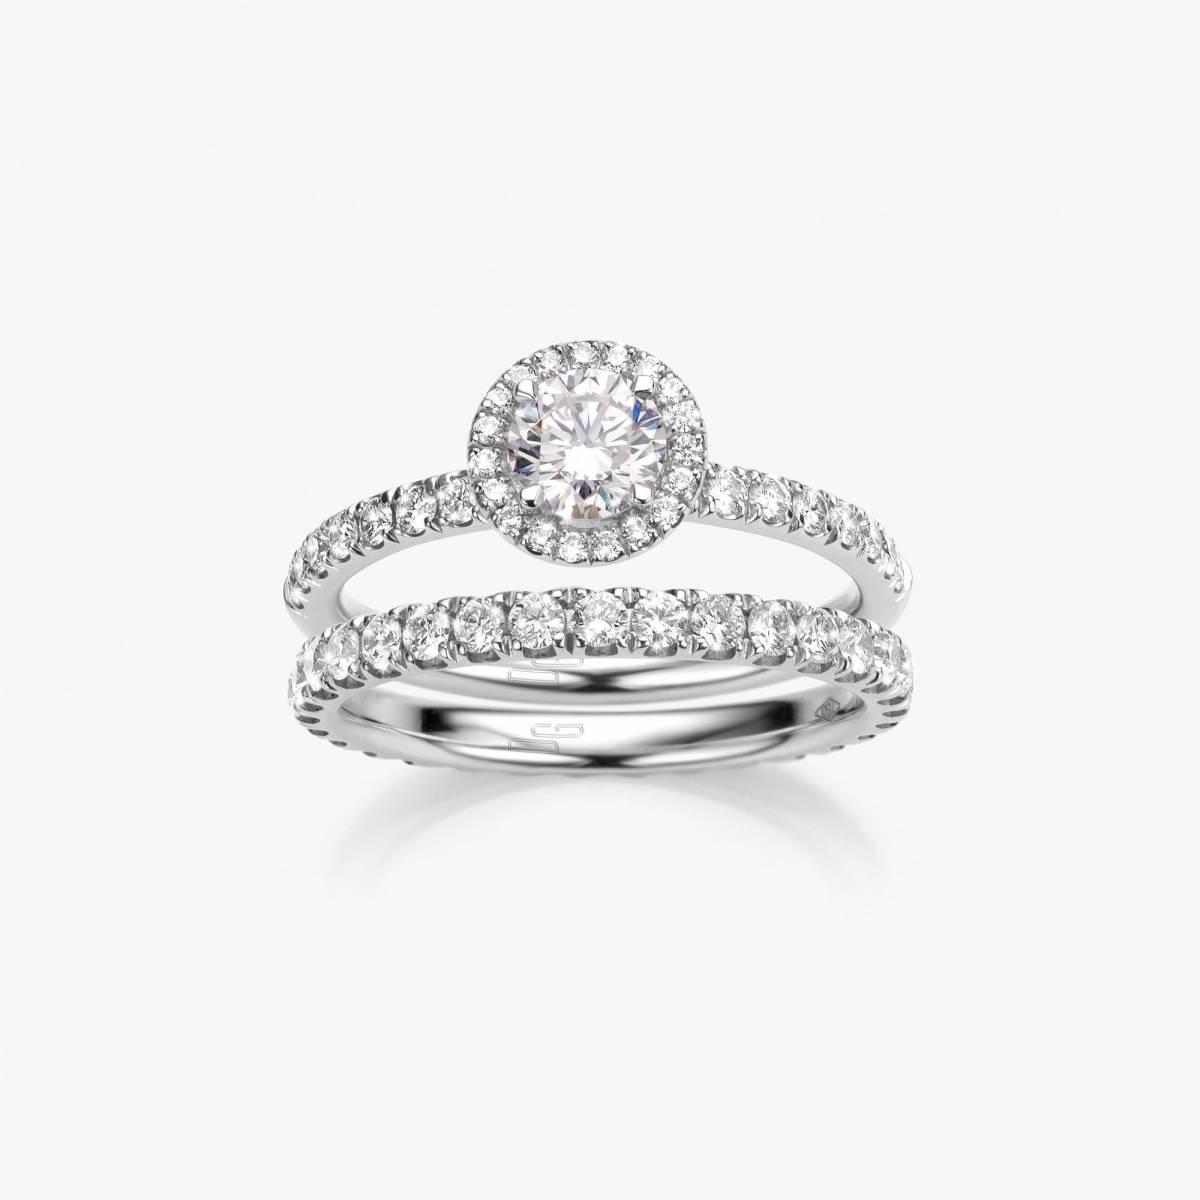 Maison De Greef - Juwelen - Brussel - Bruidsjuwelen - Trouwring - Verlovingsring - House of Weddings - 2